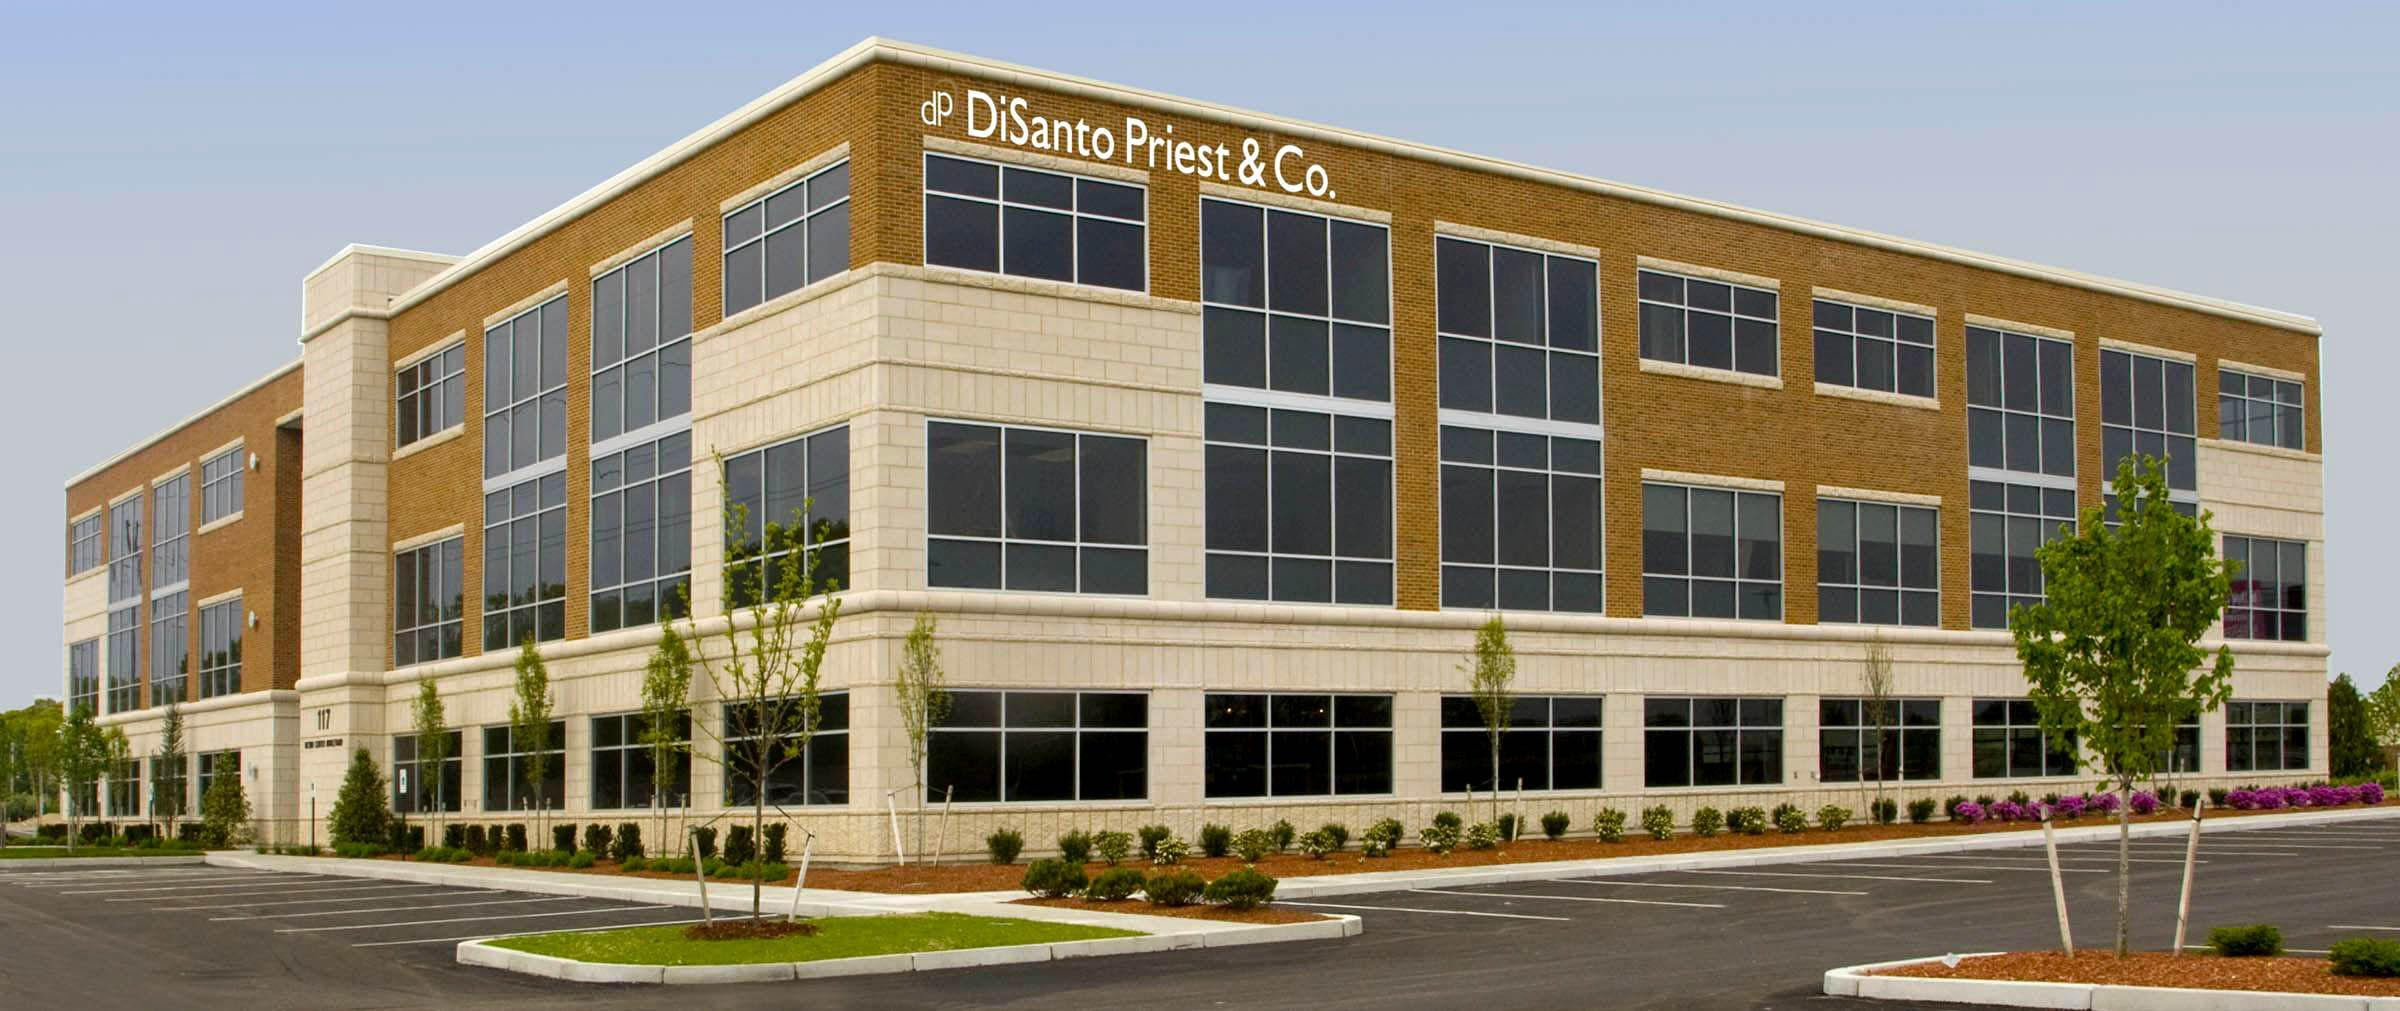 DiSanto Priest & Co. Accountants and Business Advisors